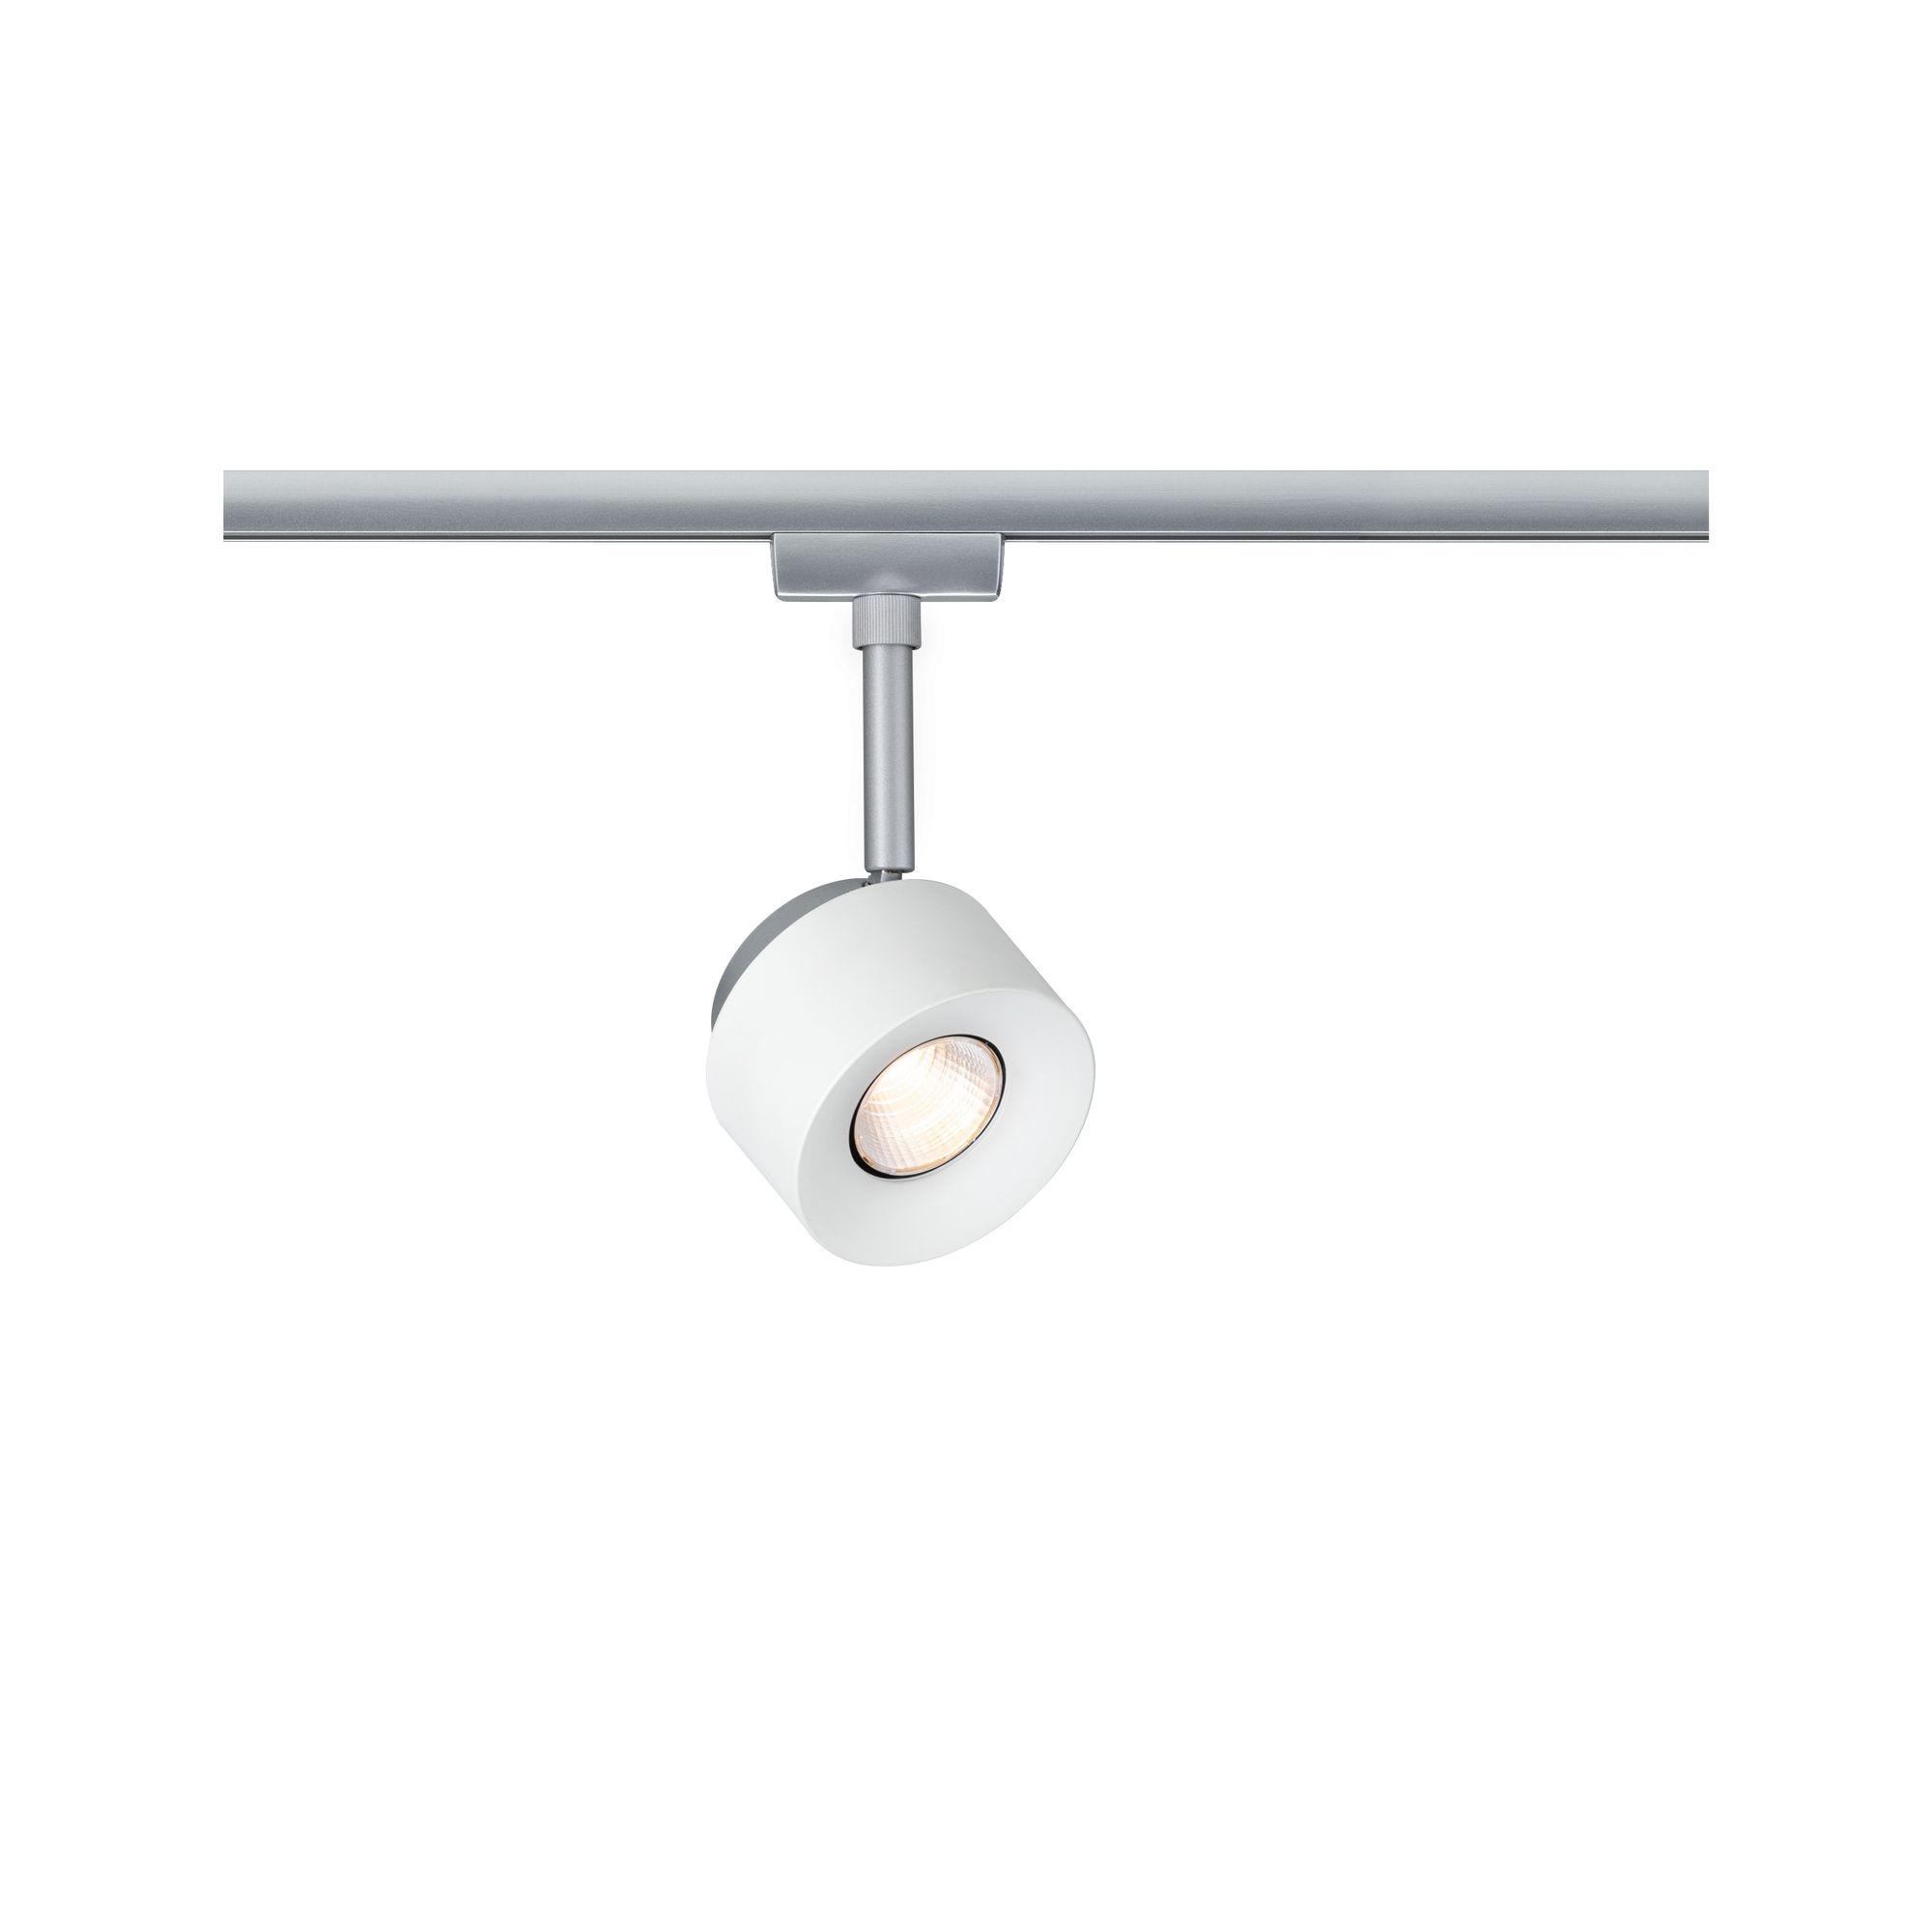 Paulmann URail LED-Spot Pane Weiß/Chrom 7,4W 2.700K